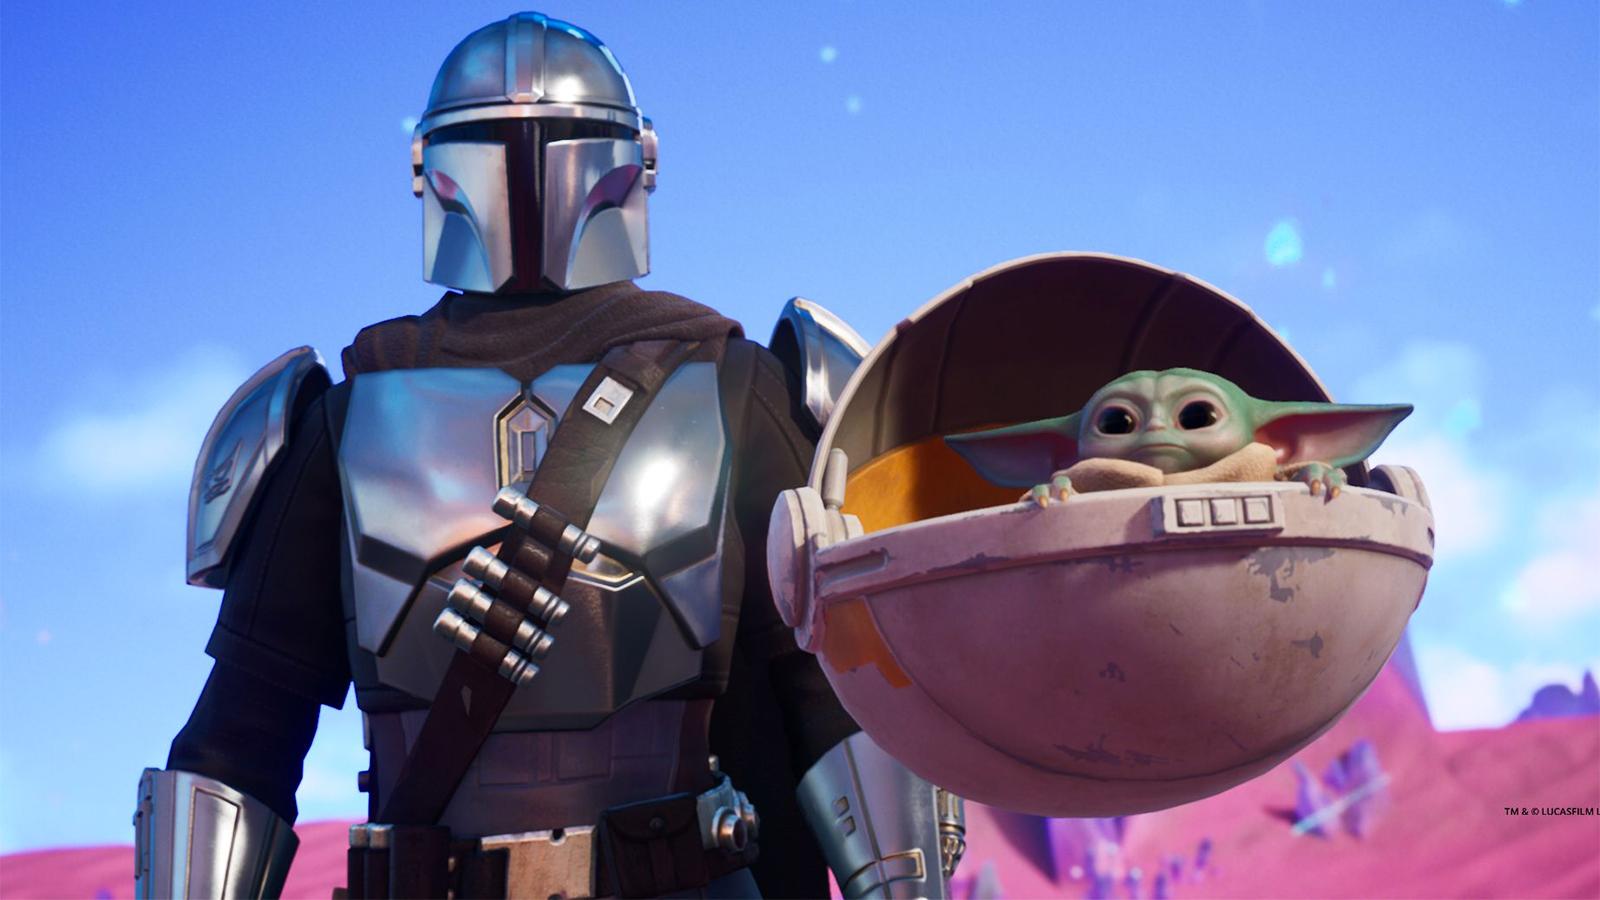 Mandalorian and Baby Yoda in Fortnite